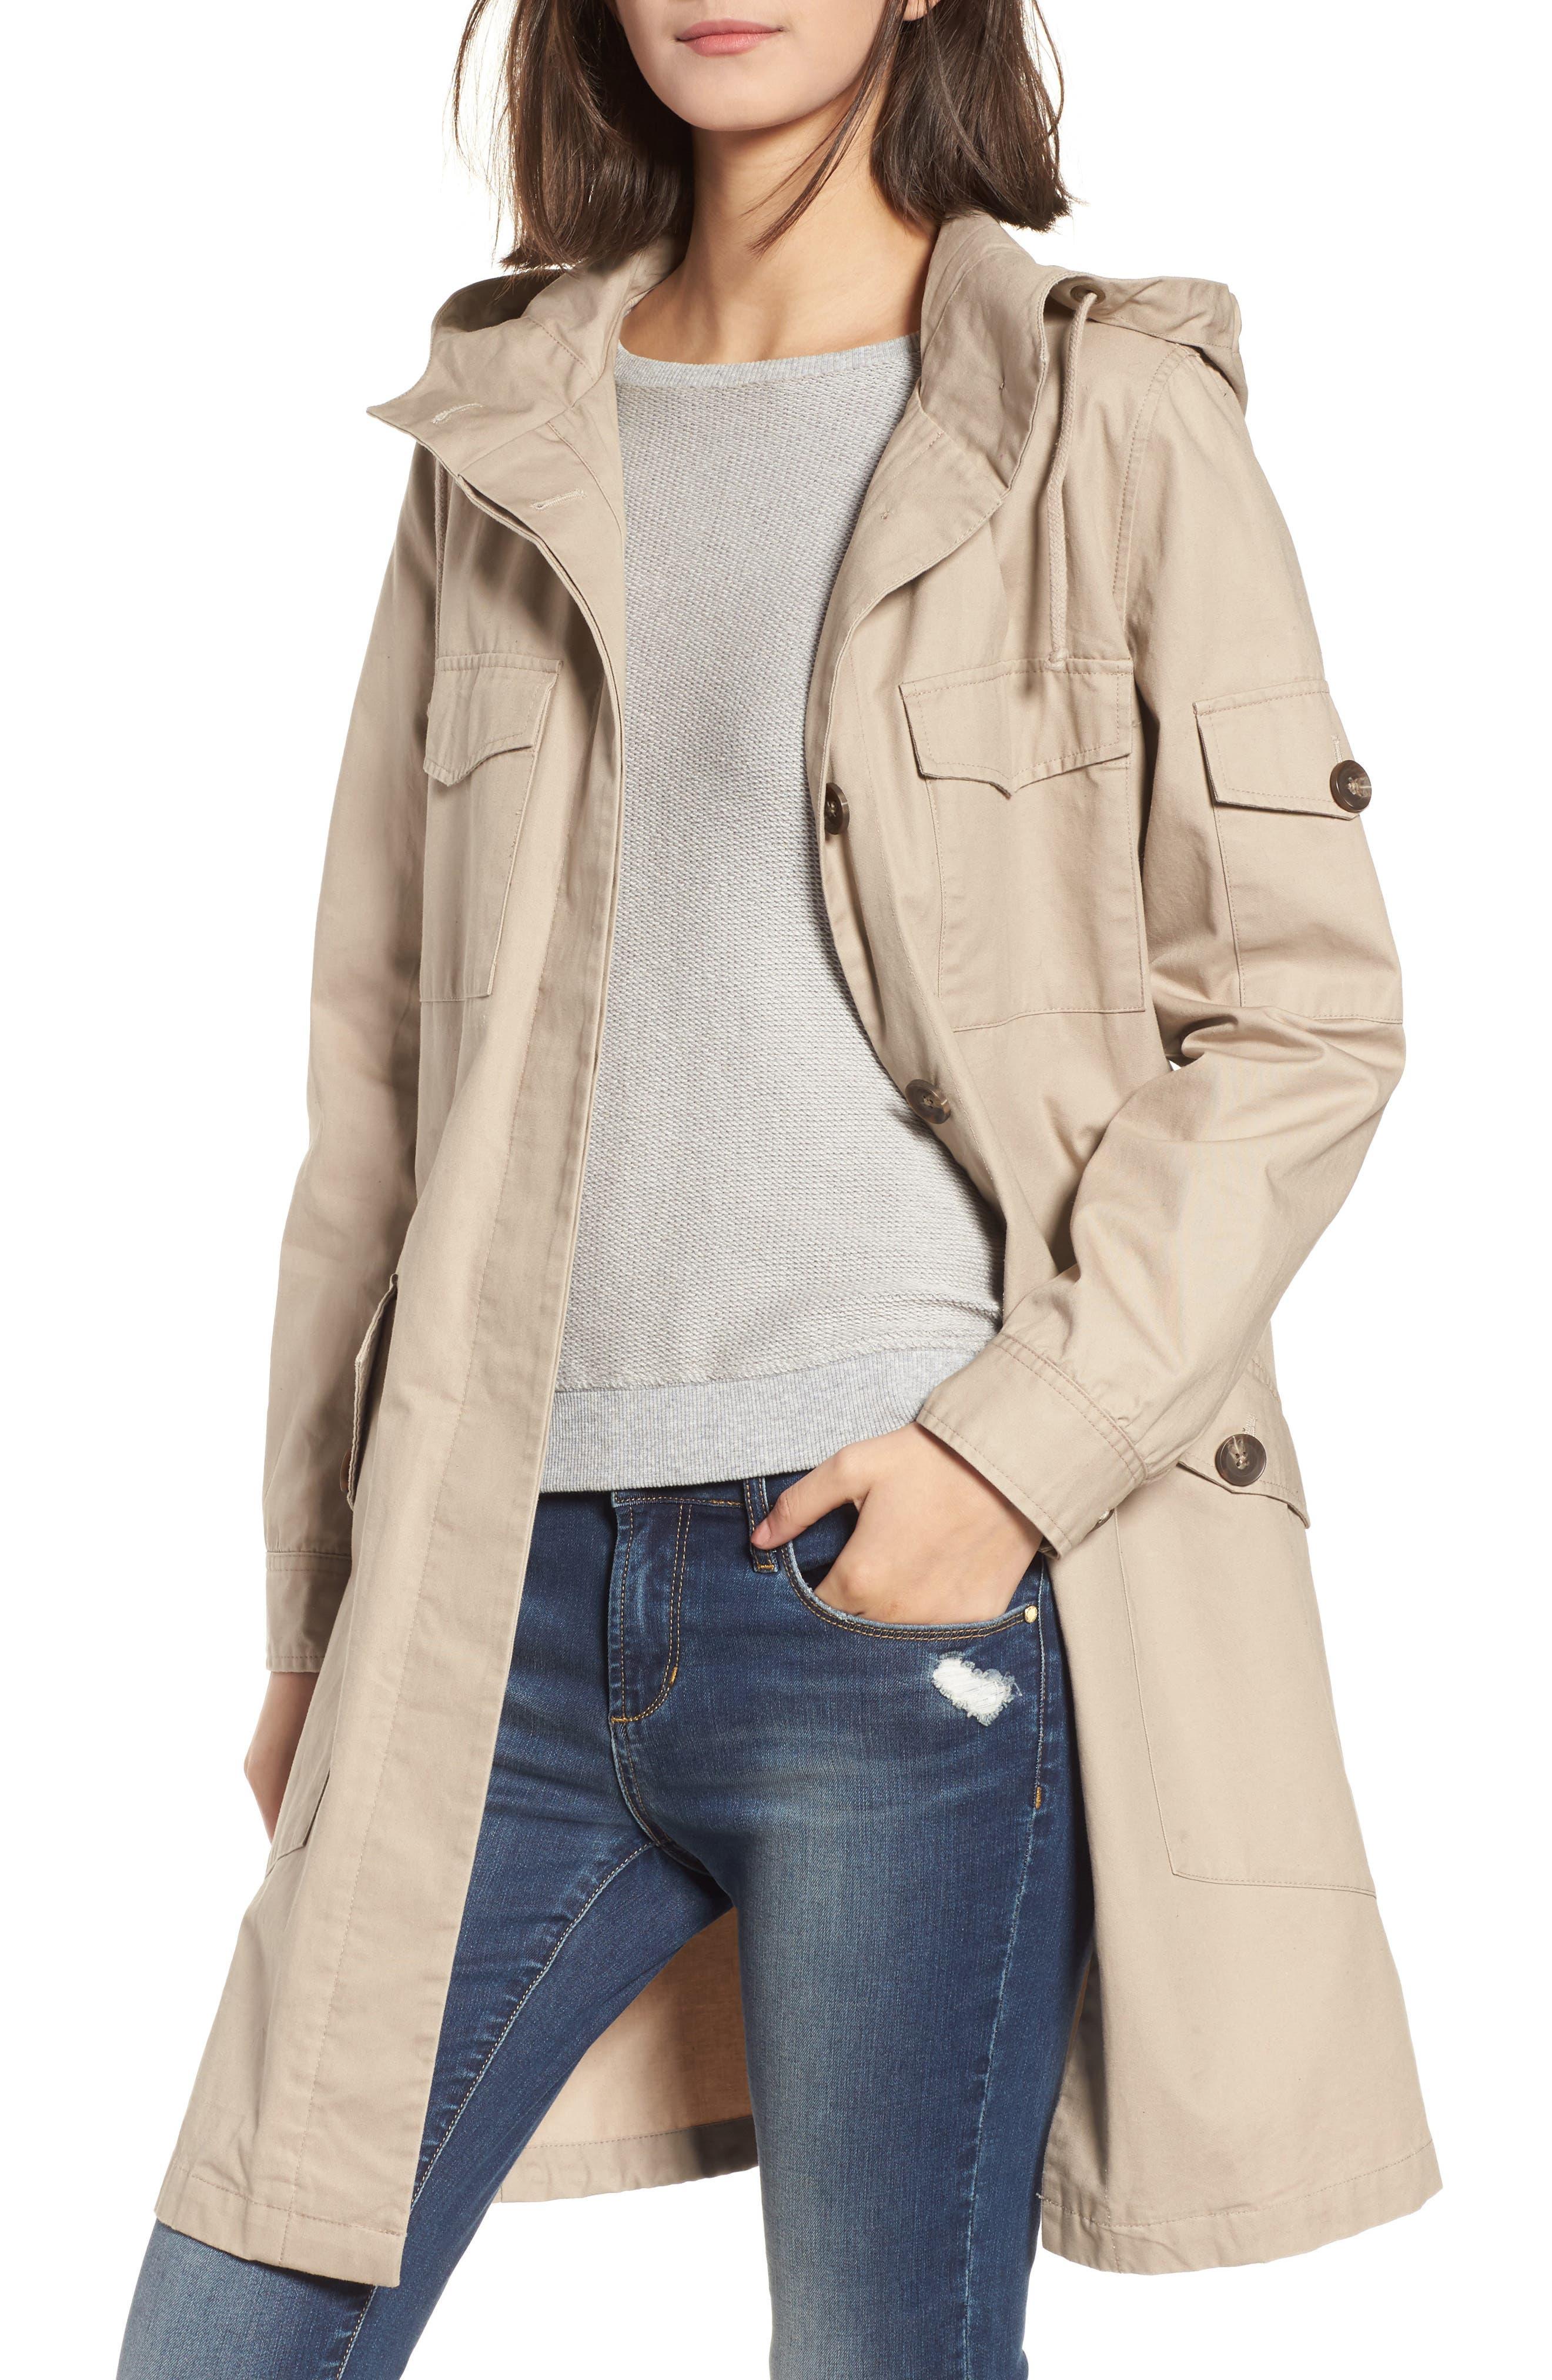 Noah Cotton Twill Coat,                             Main thumbnail 1, color,                             Cobblestone